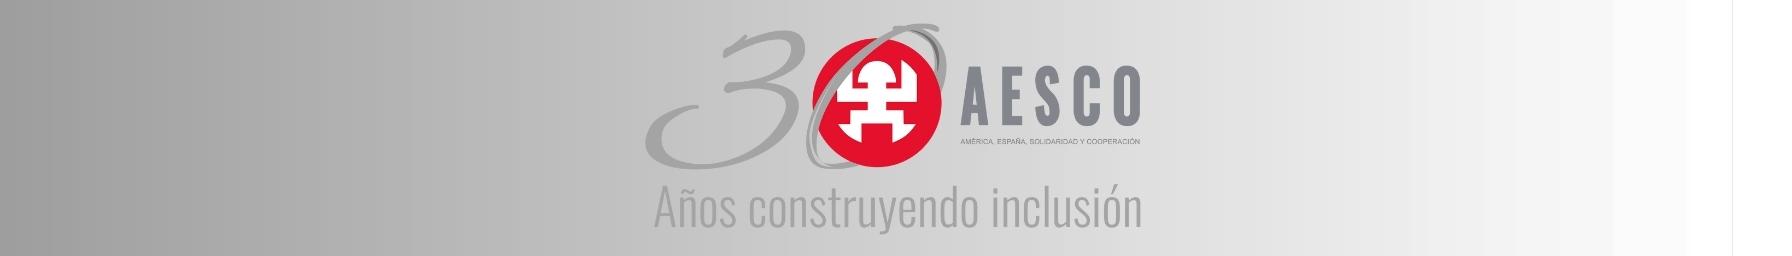 imagen 1 AESCO ONG